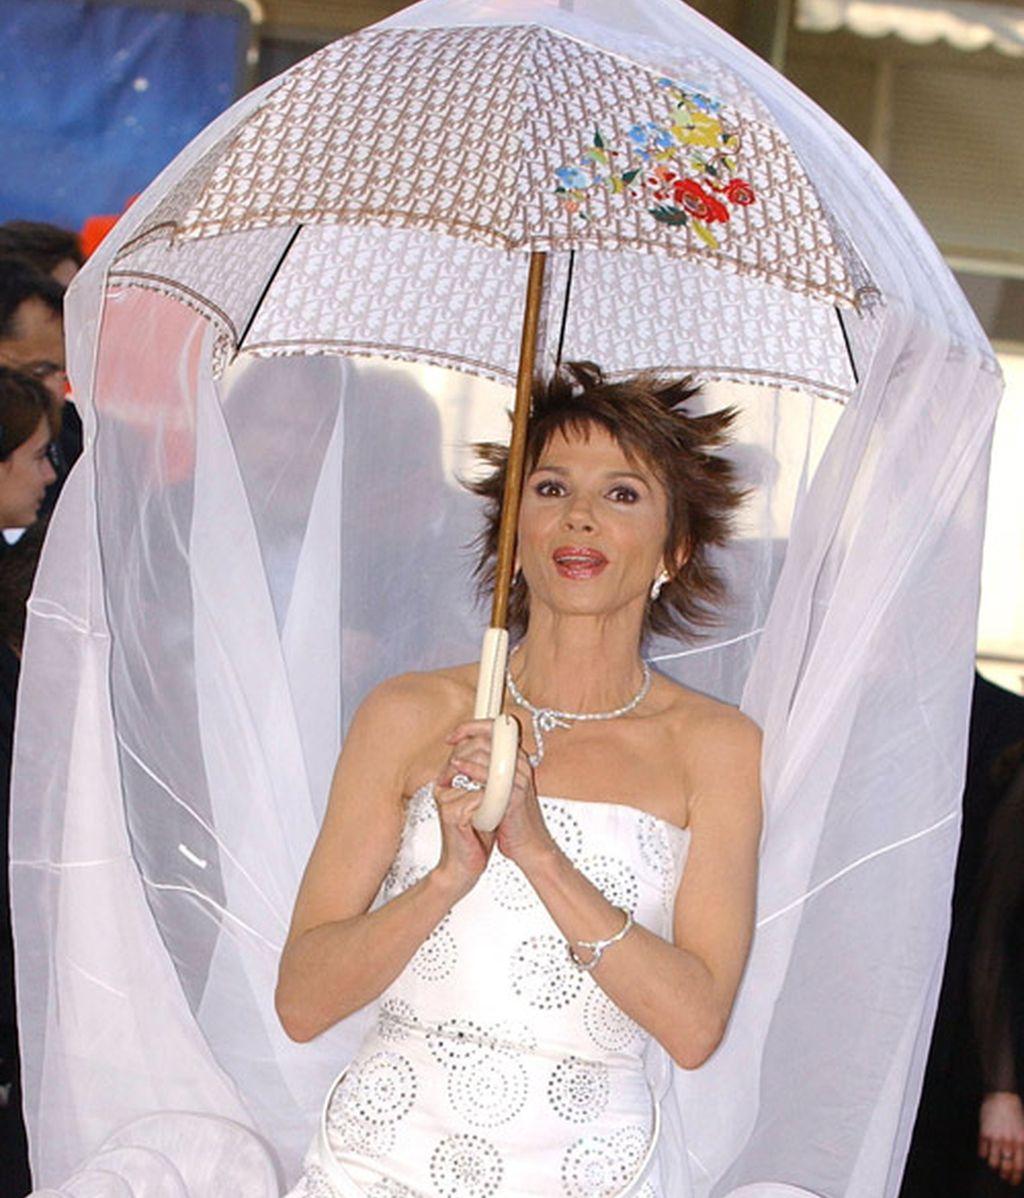 Las gotas hacen chip en sus paraguas chic